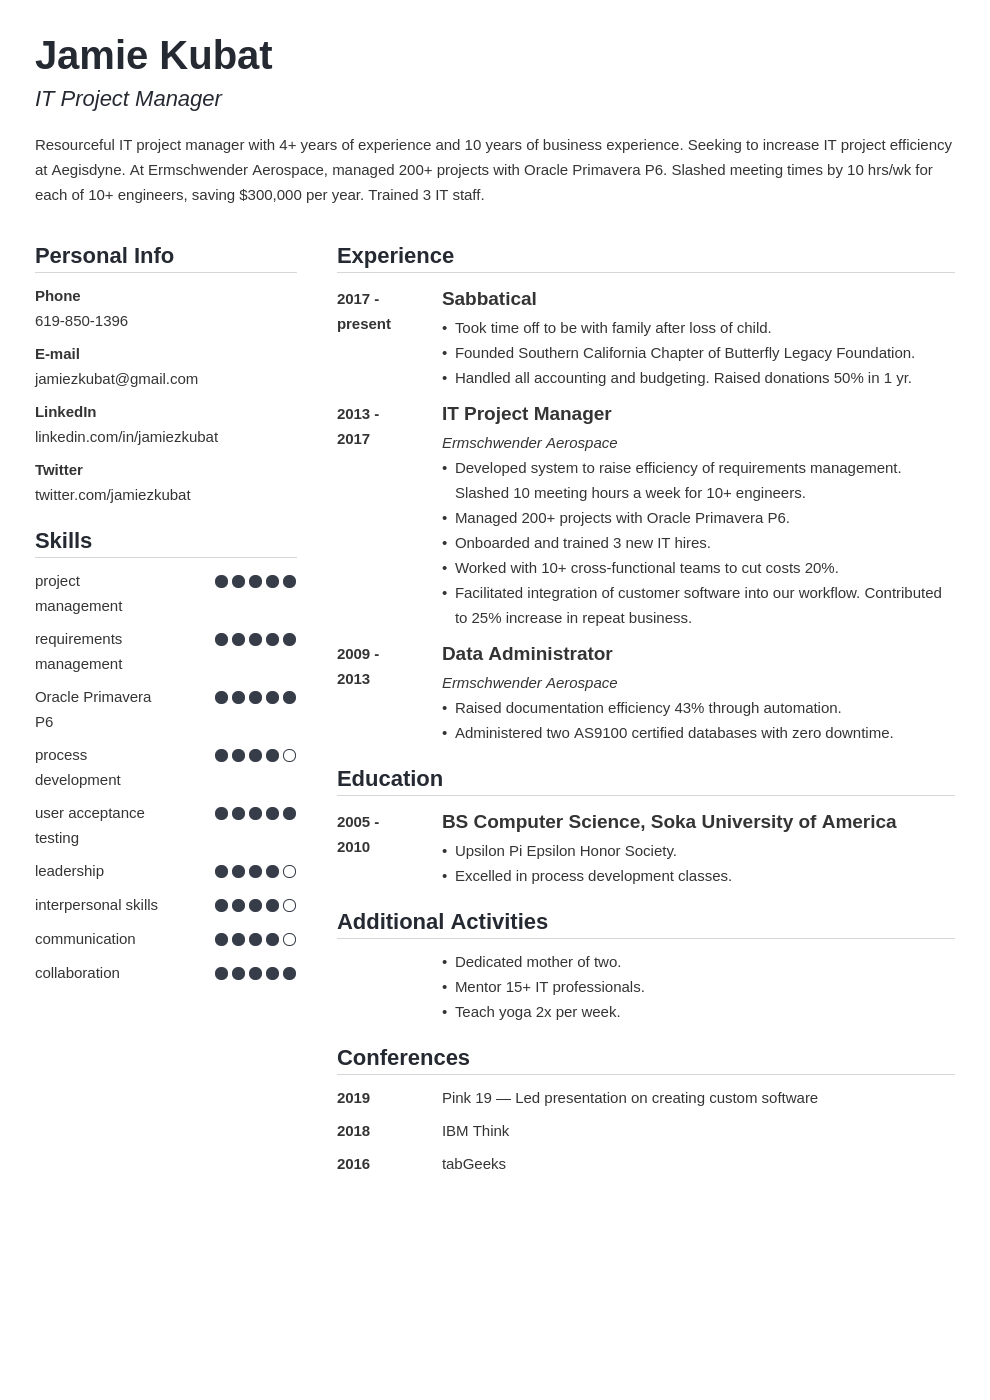 resume employment gaps template simple uk